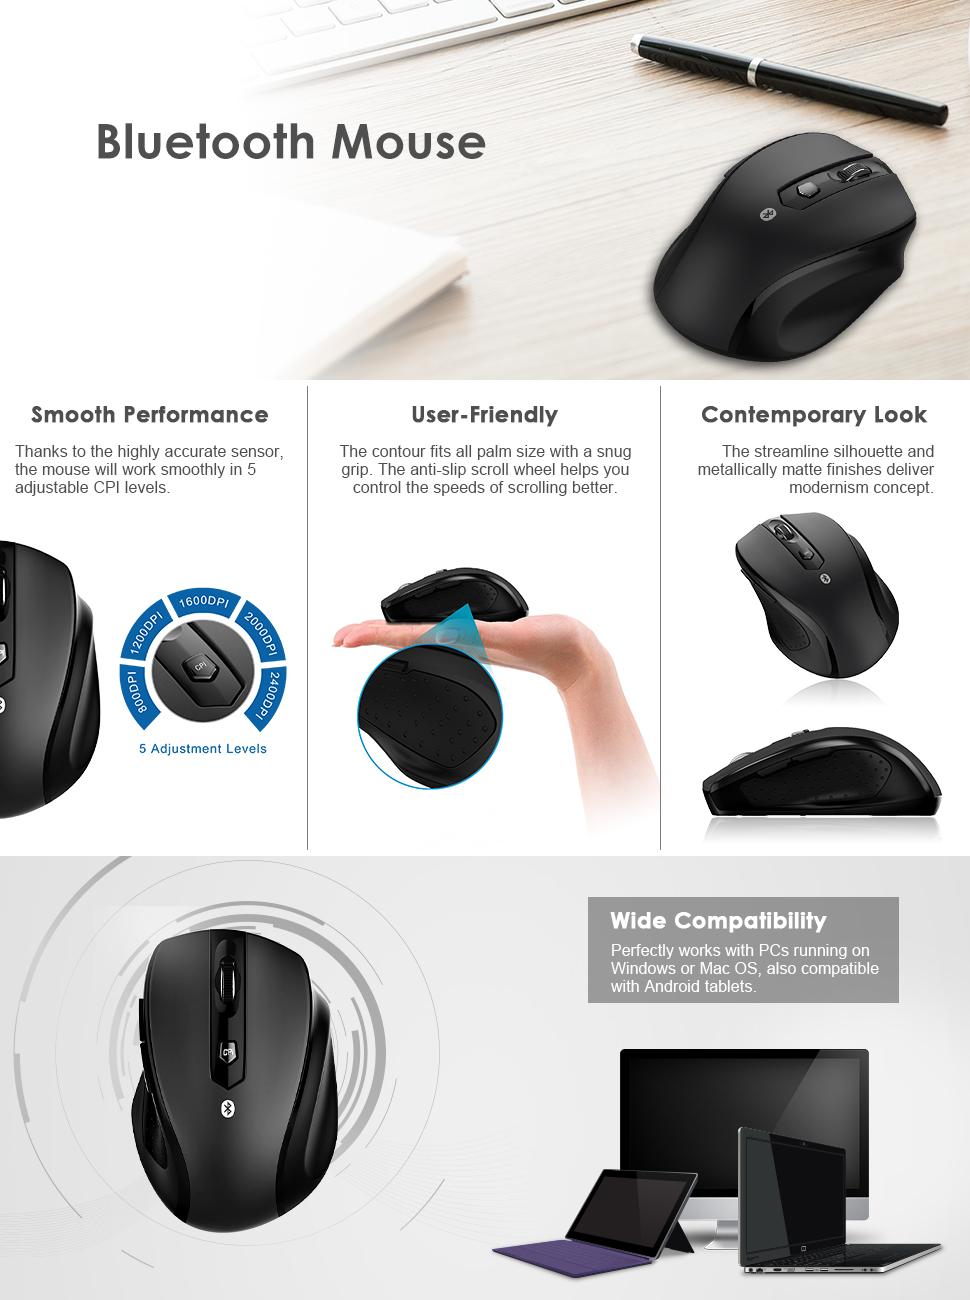 jetech m0884 bluetooth wireless mouse instructions